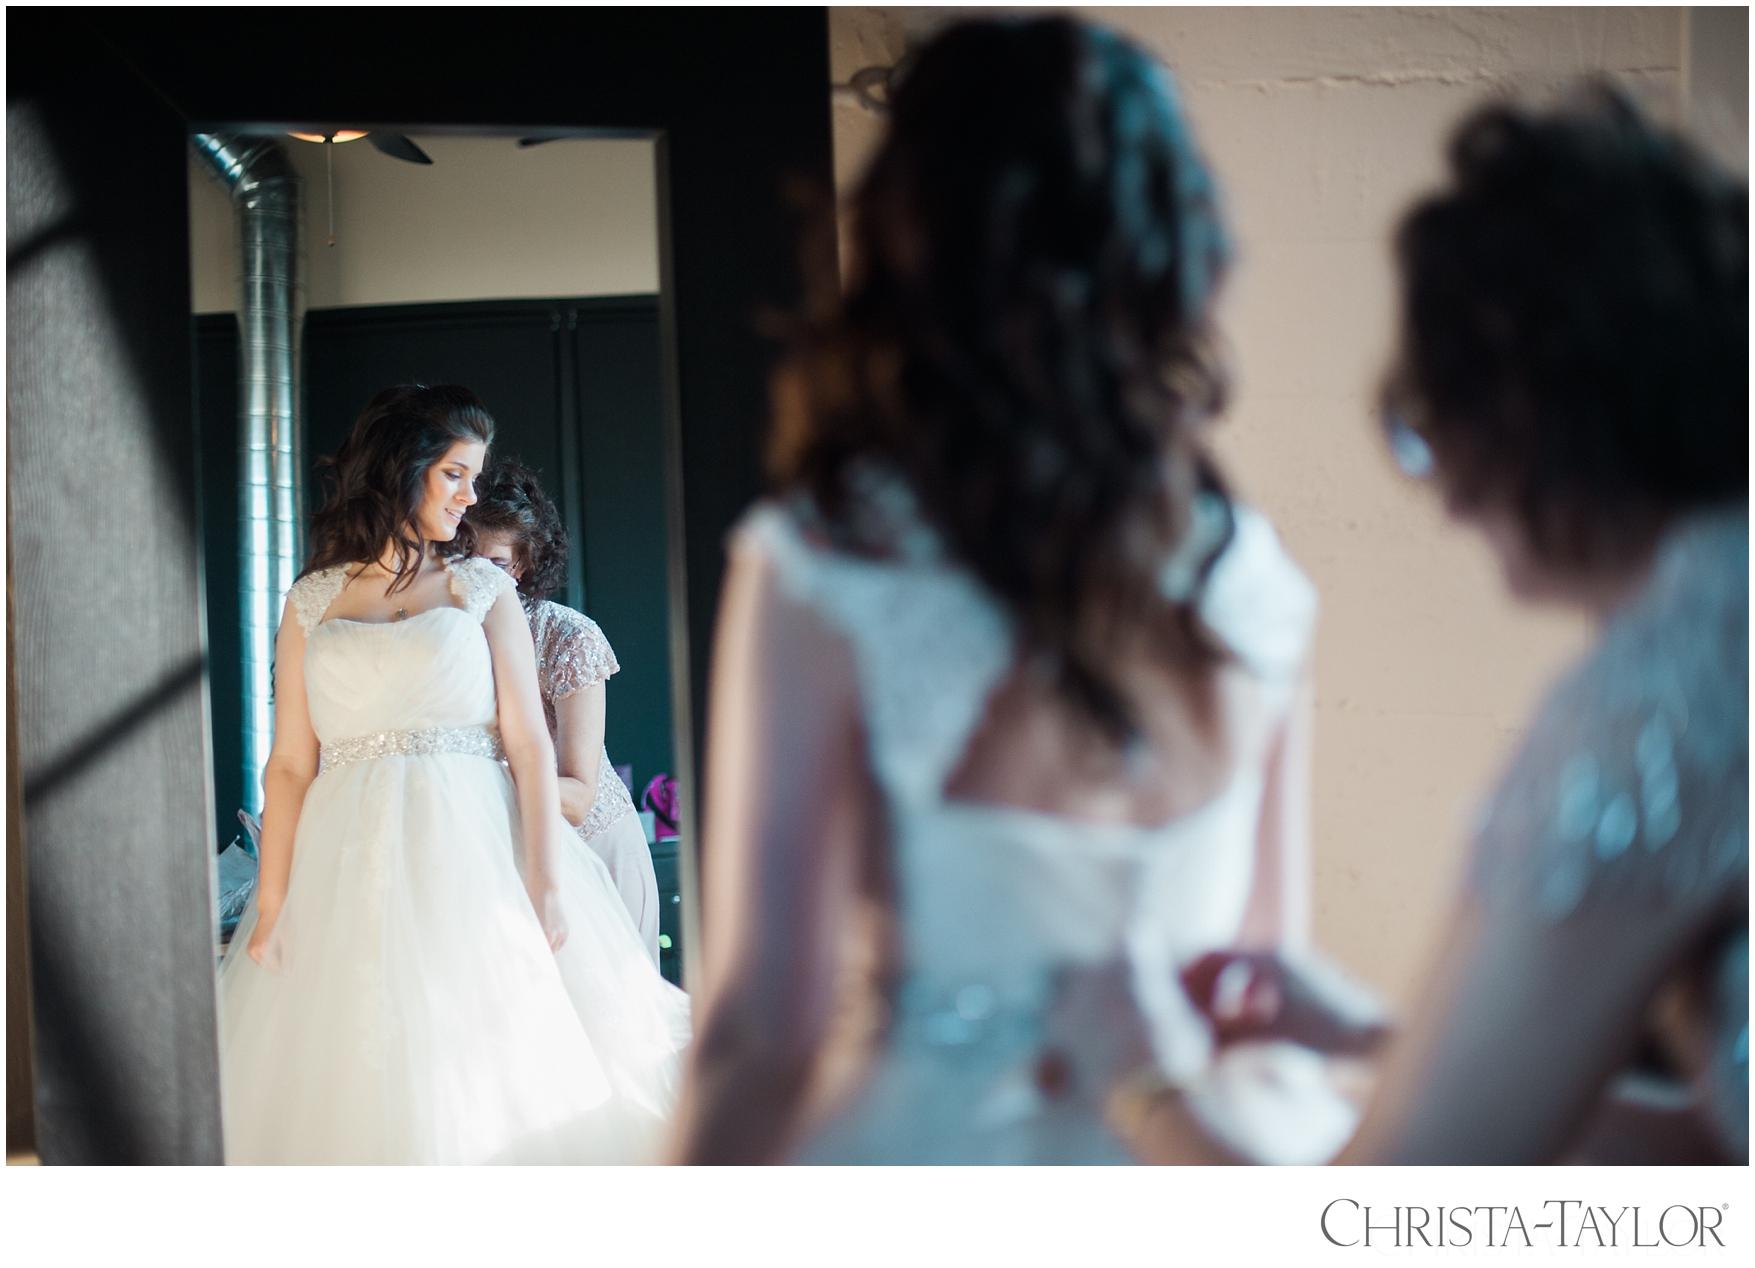 castaway portland wedding christa taylor_2257.jpg